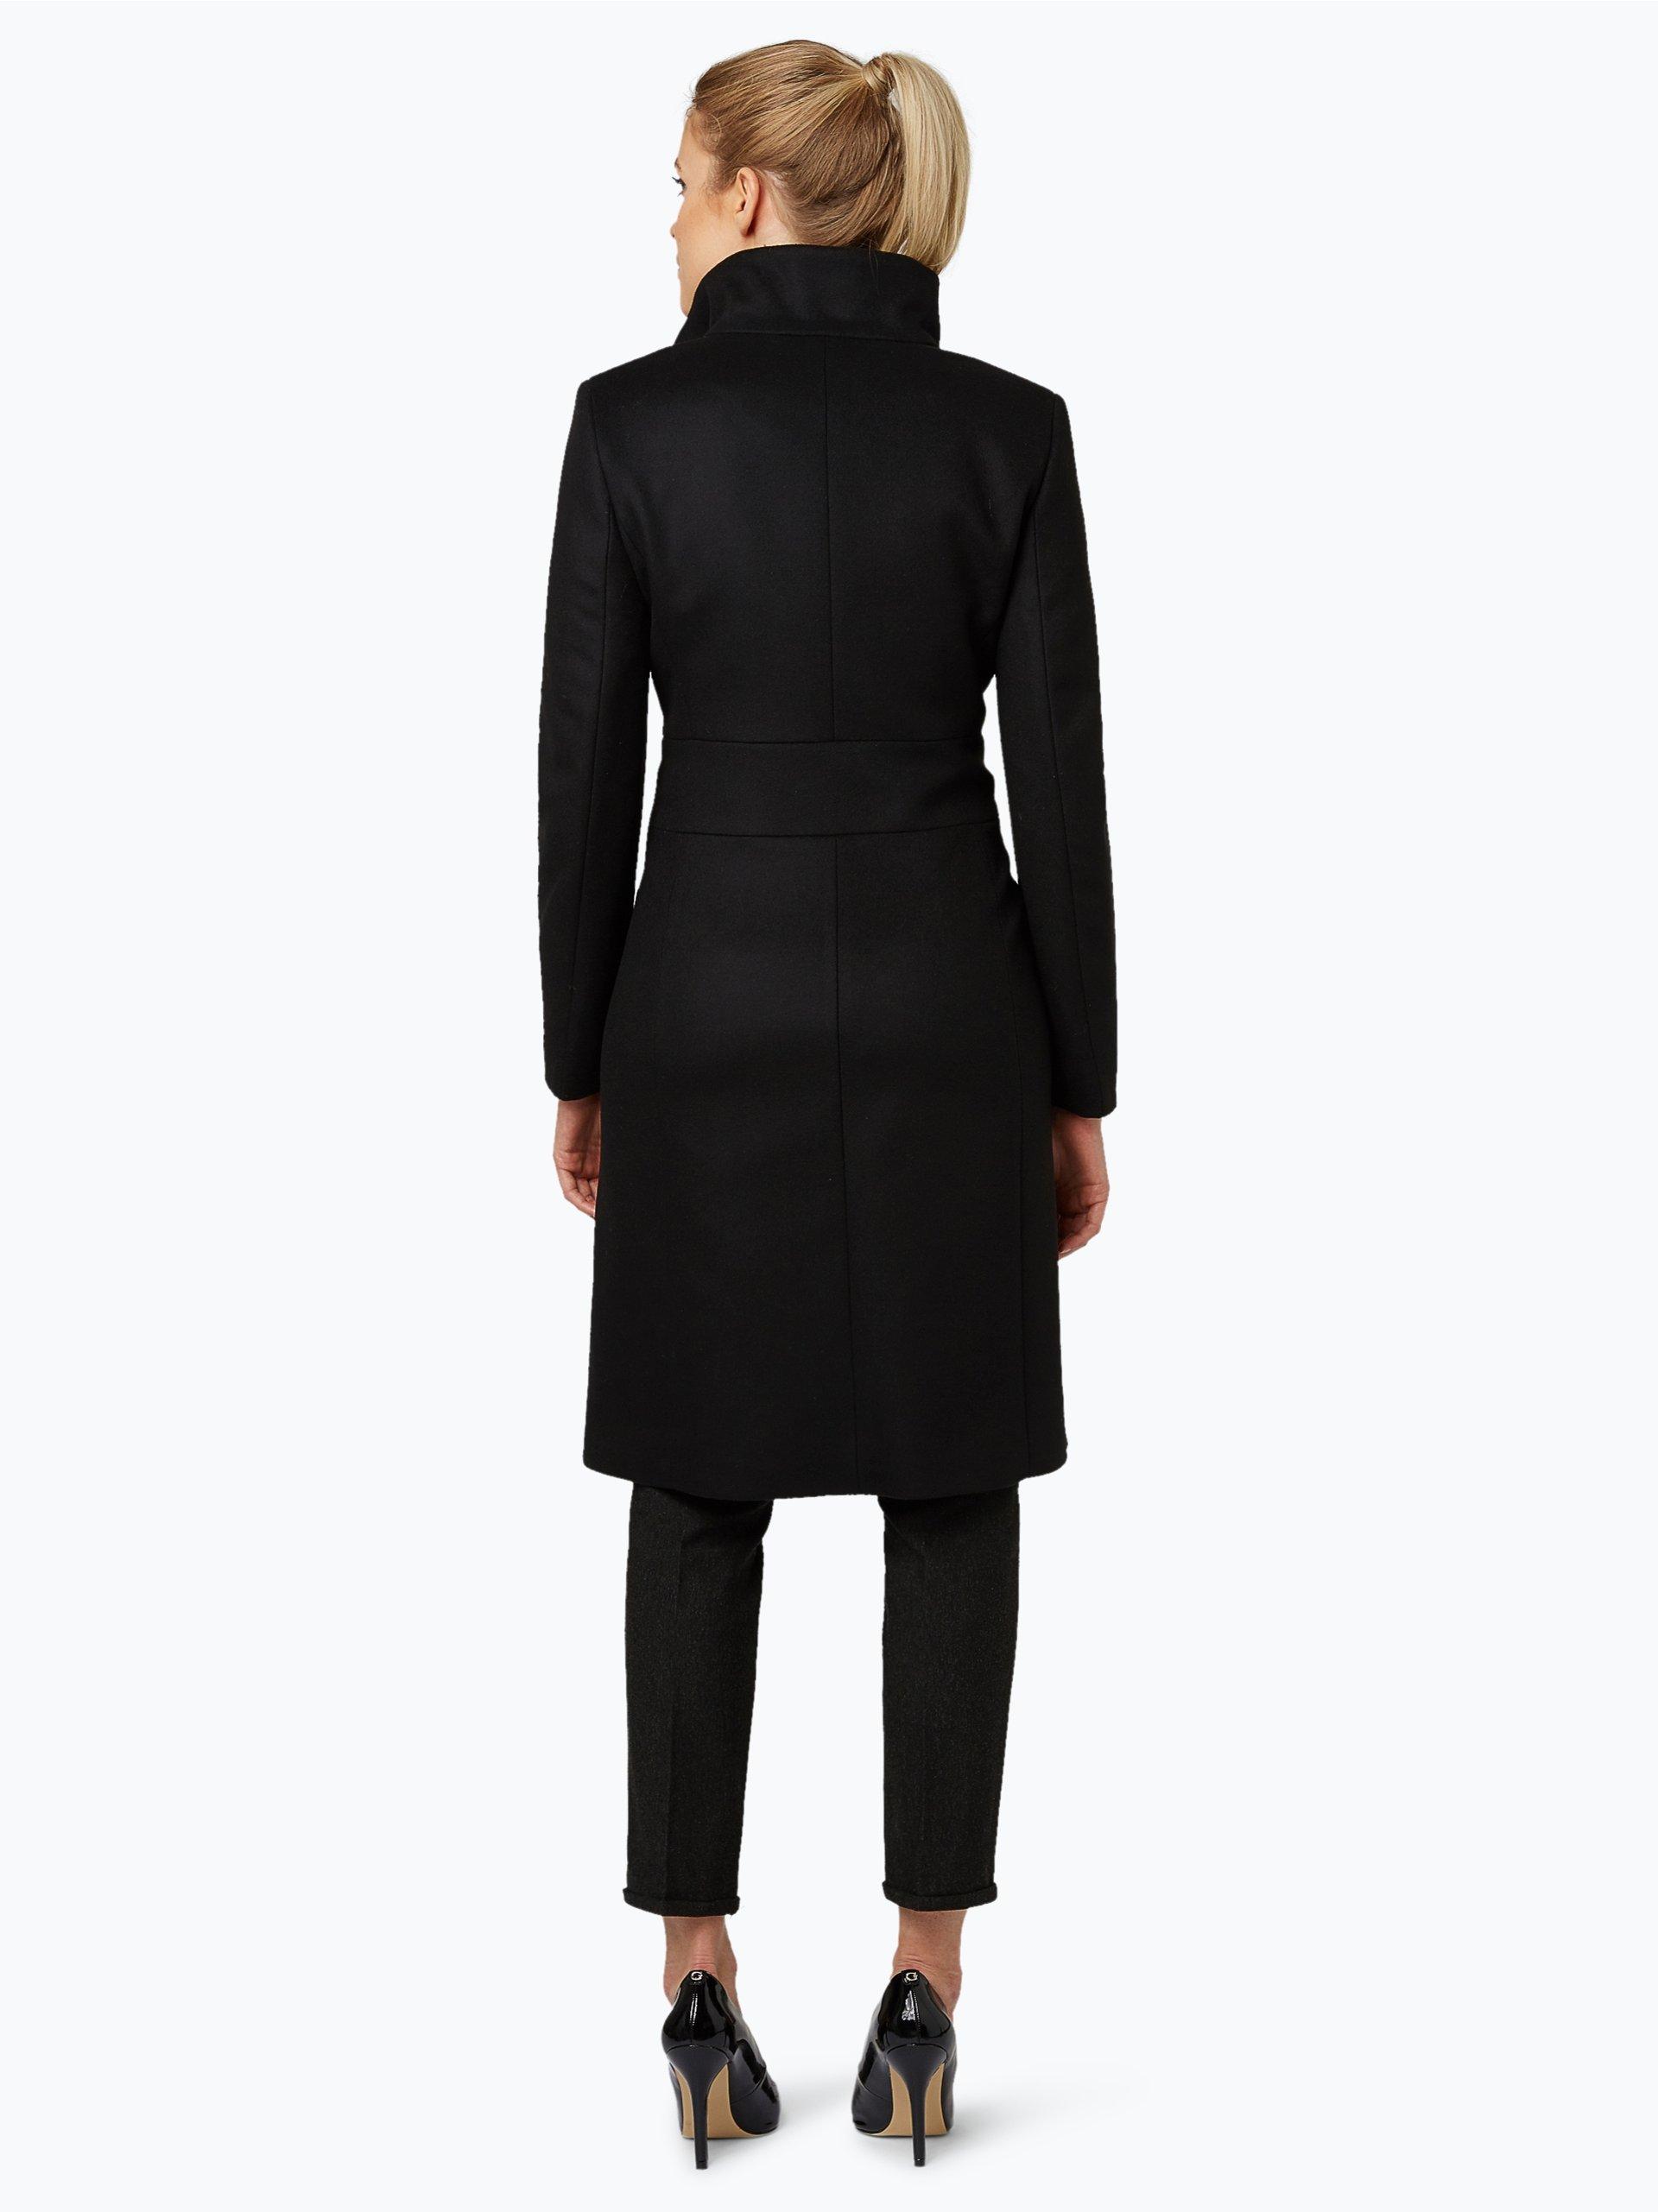 hugo damen mantel mit cashmere anteil mivana schwarz uni online kaufen vangraaf com. Black Bedroom Furniture Sets. Home Design Ideas